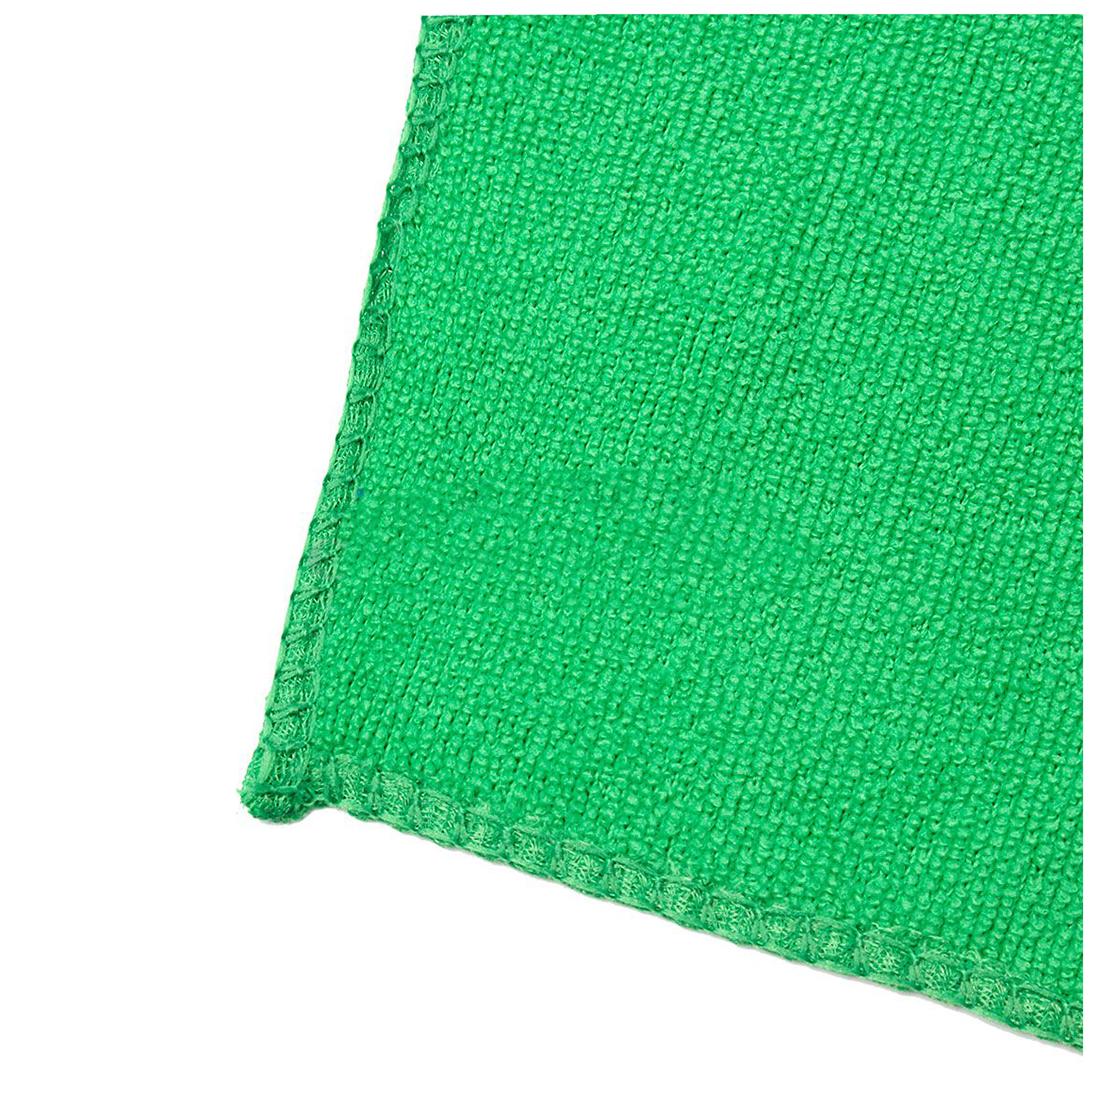 Green Microfiber Towel: 10pcs Towels Cleaning Towel Car Washing Cloth Microfiber